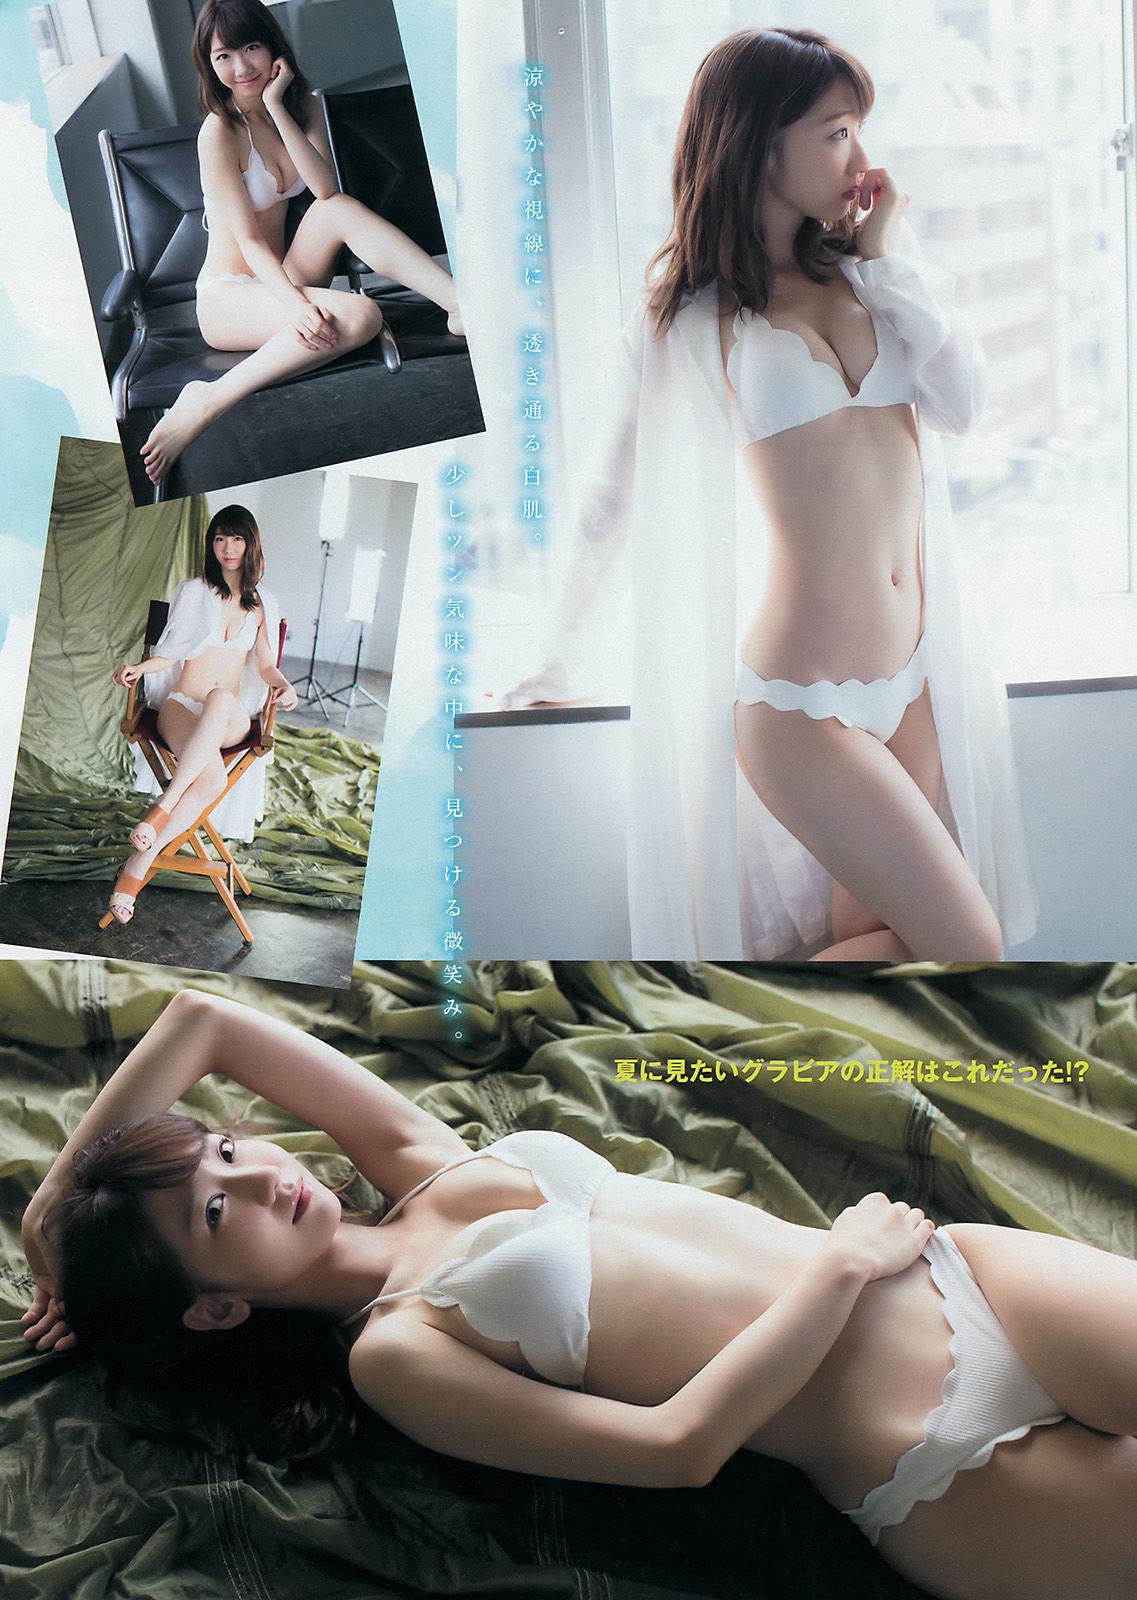 VOL.593 [Young Magazine]杂志:柏木由纪超高清写真套图(15P)